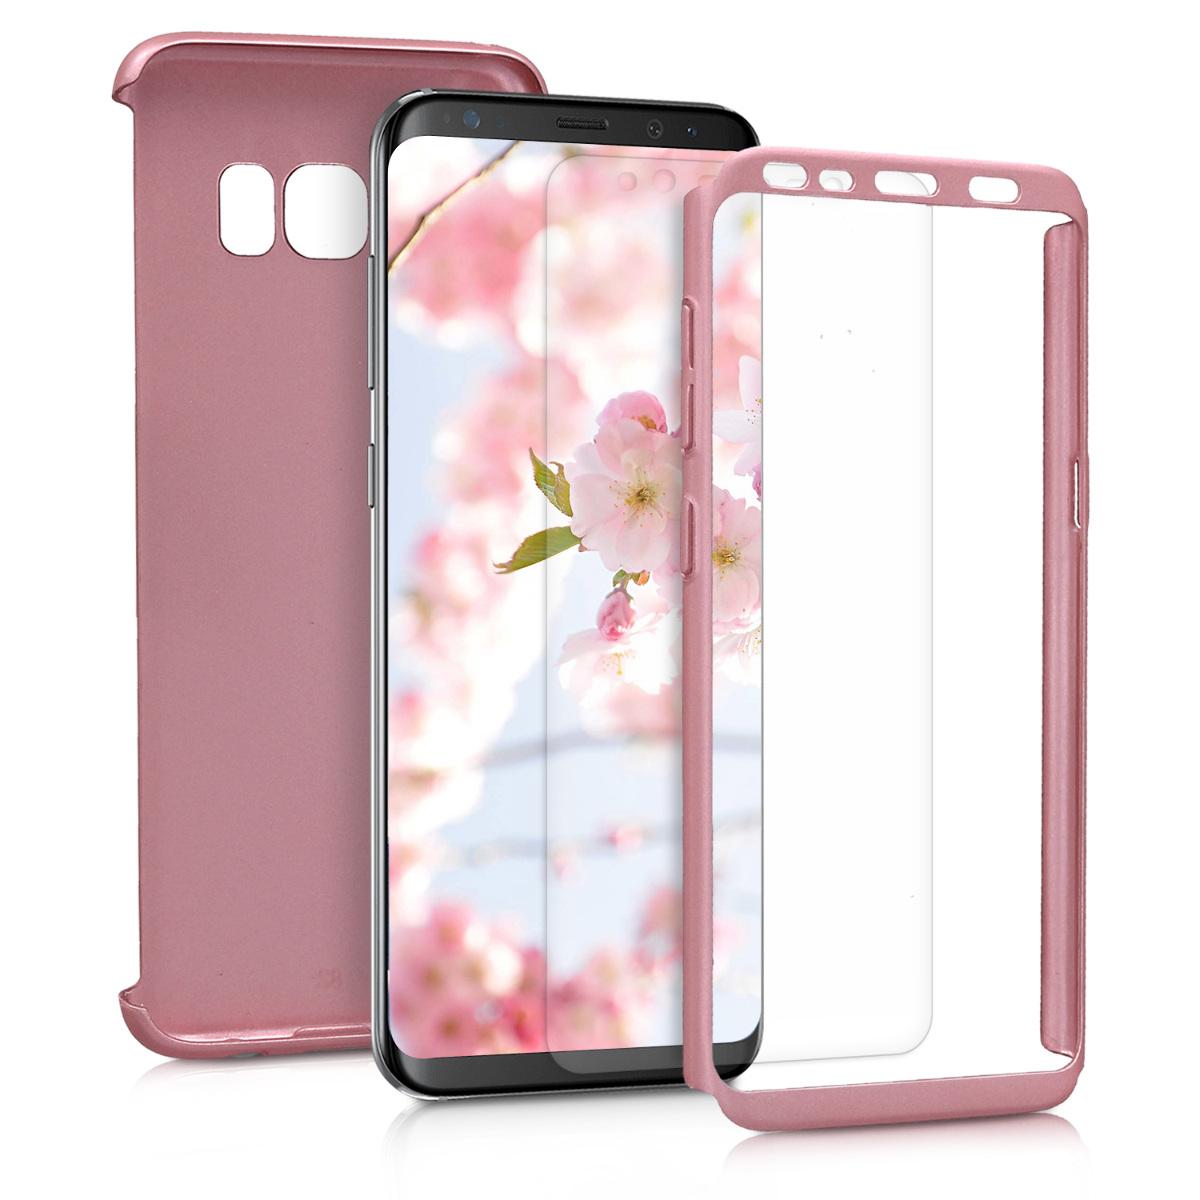 KW Θήκη Full Body για Samsung Galaxy S8 & Screen Protector - Μεταλλικό ροζ χαλκινο (43781.31)